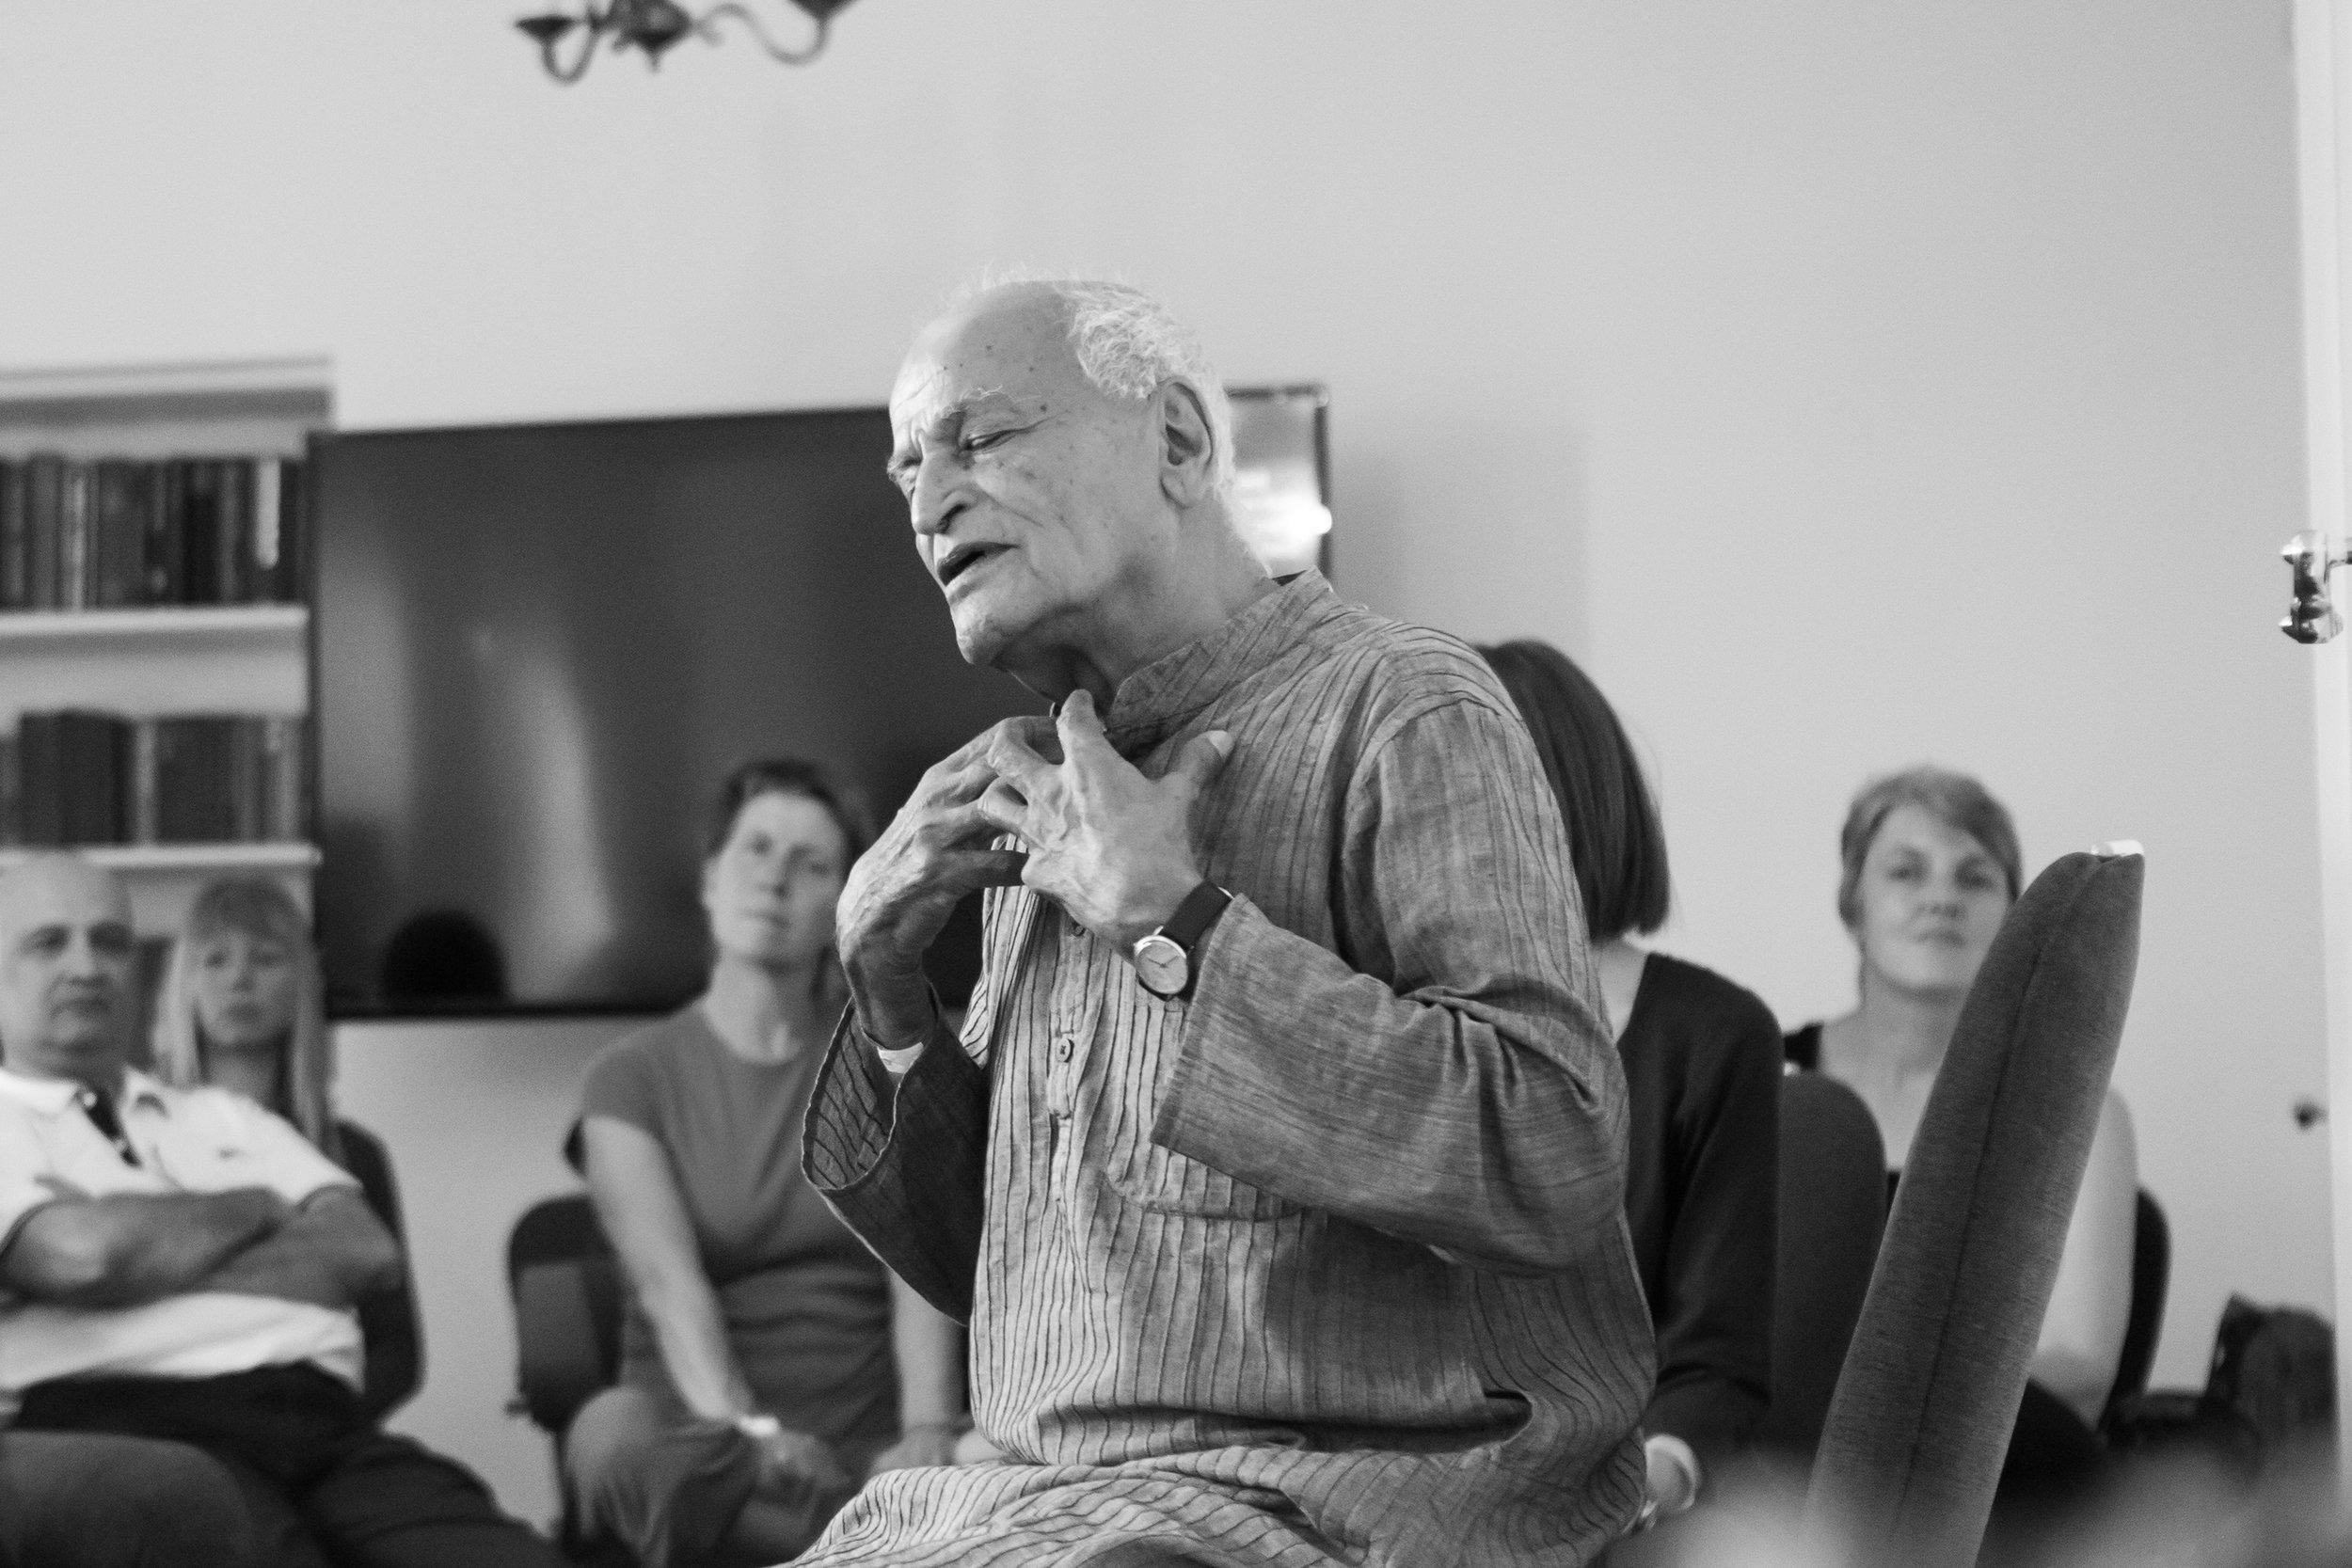 SEMINARS - Seminars and theory-based masterclasses exploring topics from yoga's history and philosophy to astrology.